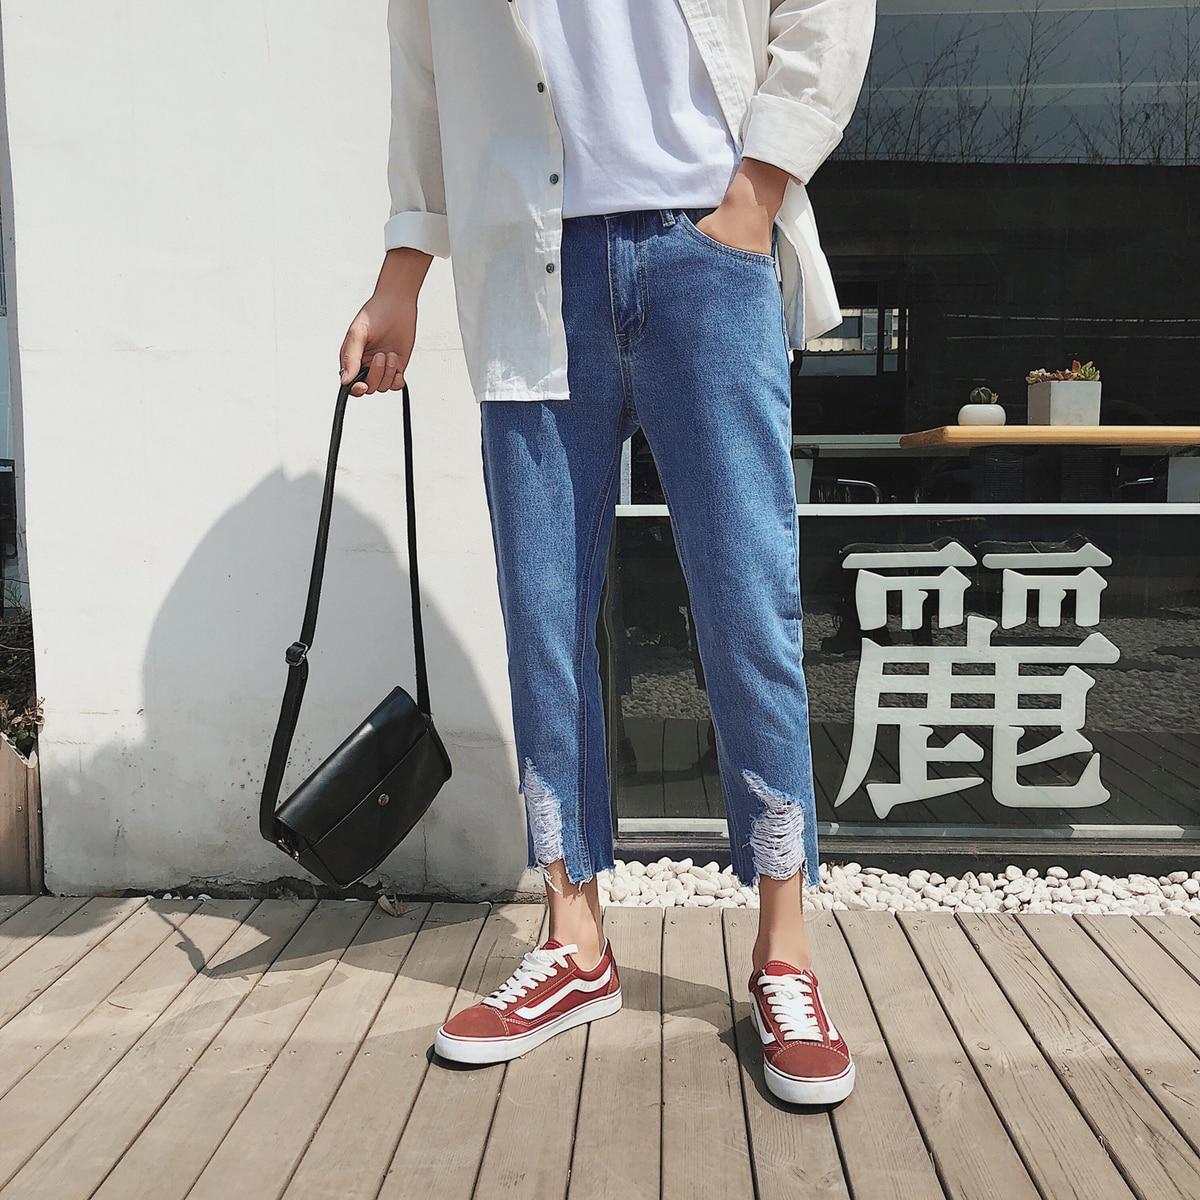 2018 Korean Spring Summer New Men Fashion Tide Do Old Broken Haren Ankle-Length Pants Slim Fit Casual Blue Color Trousers S-2XL